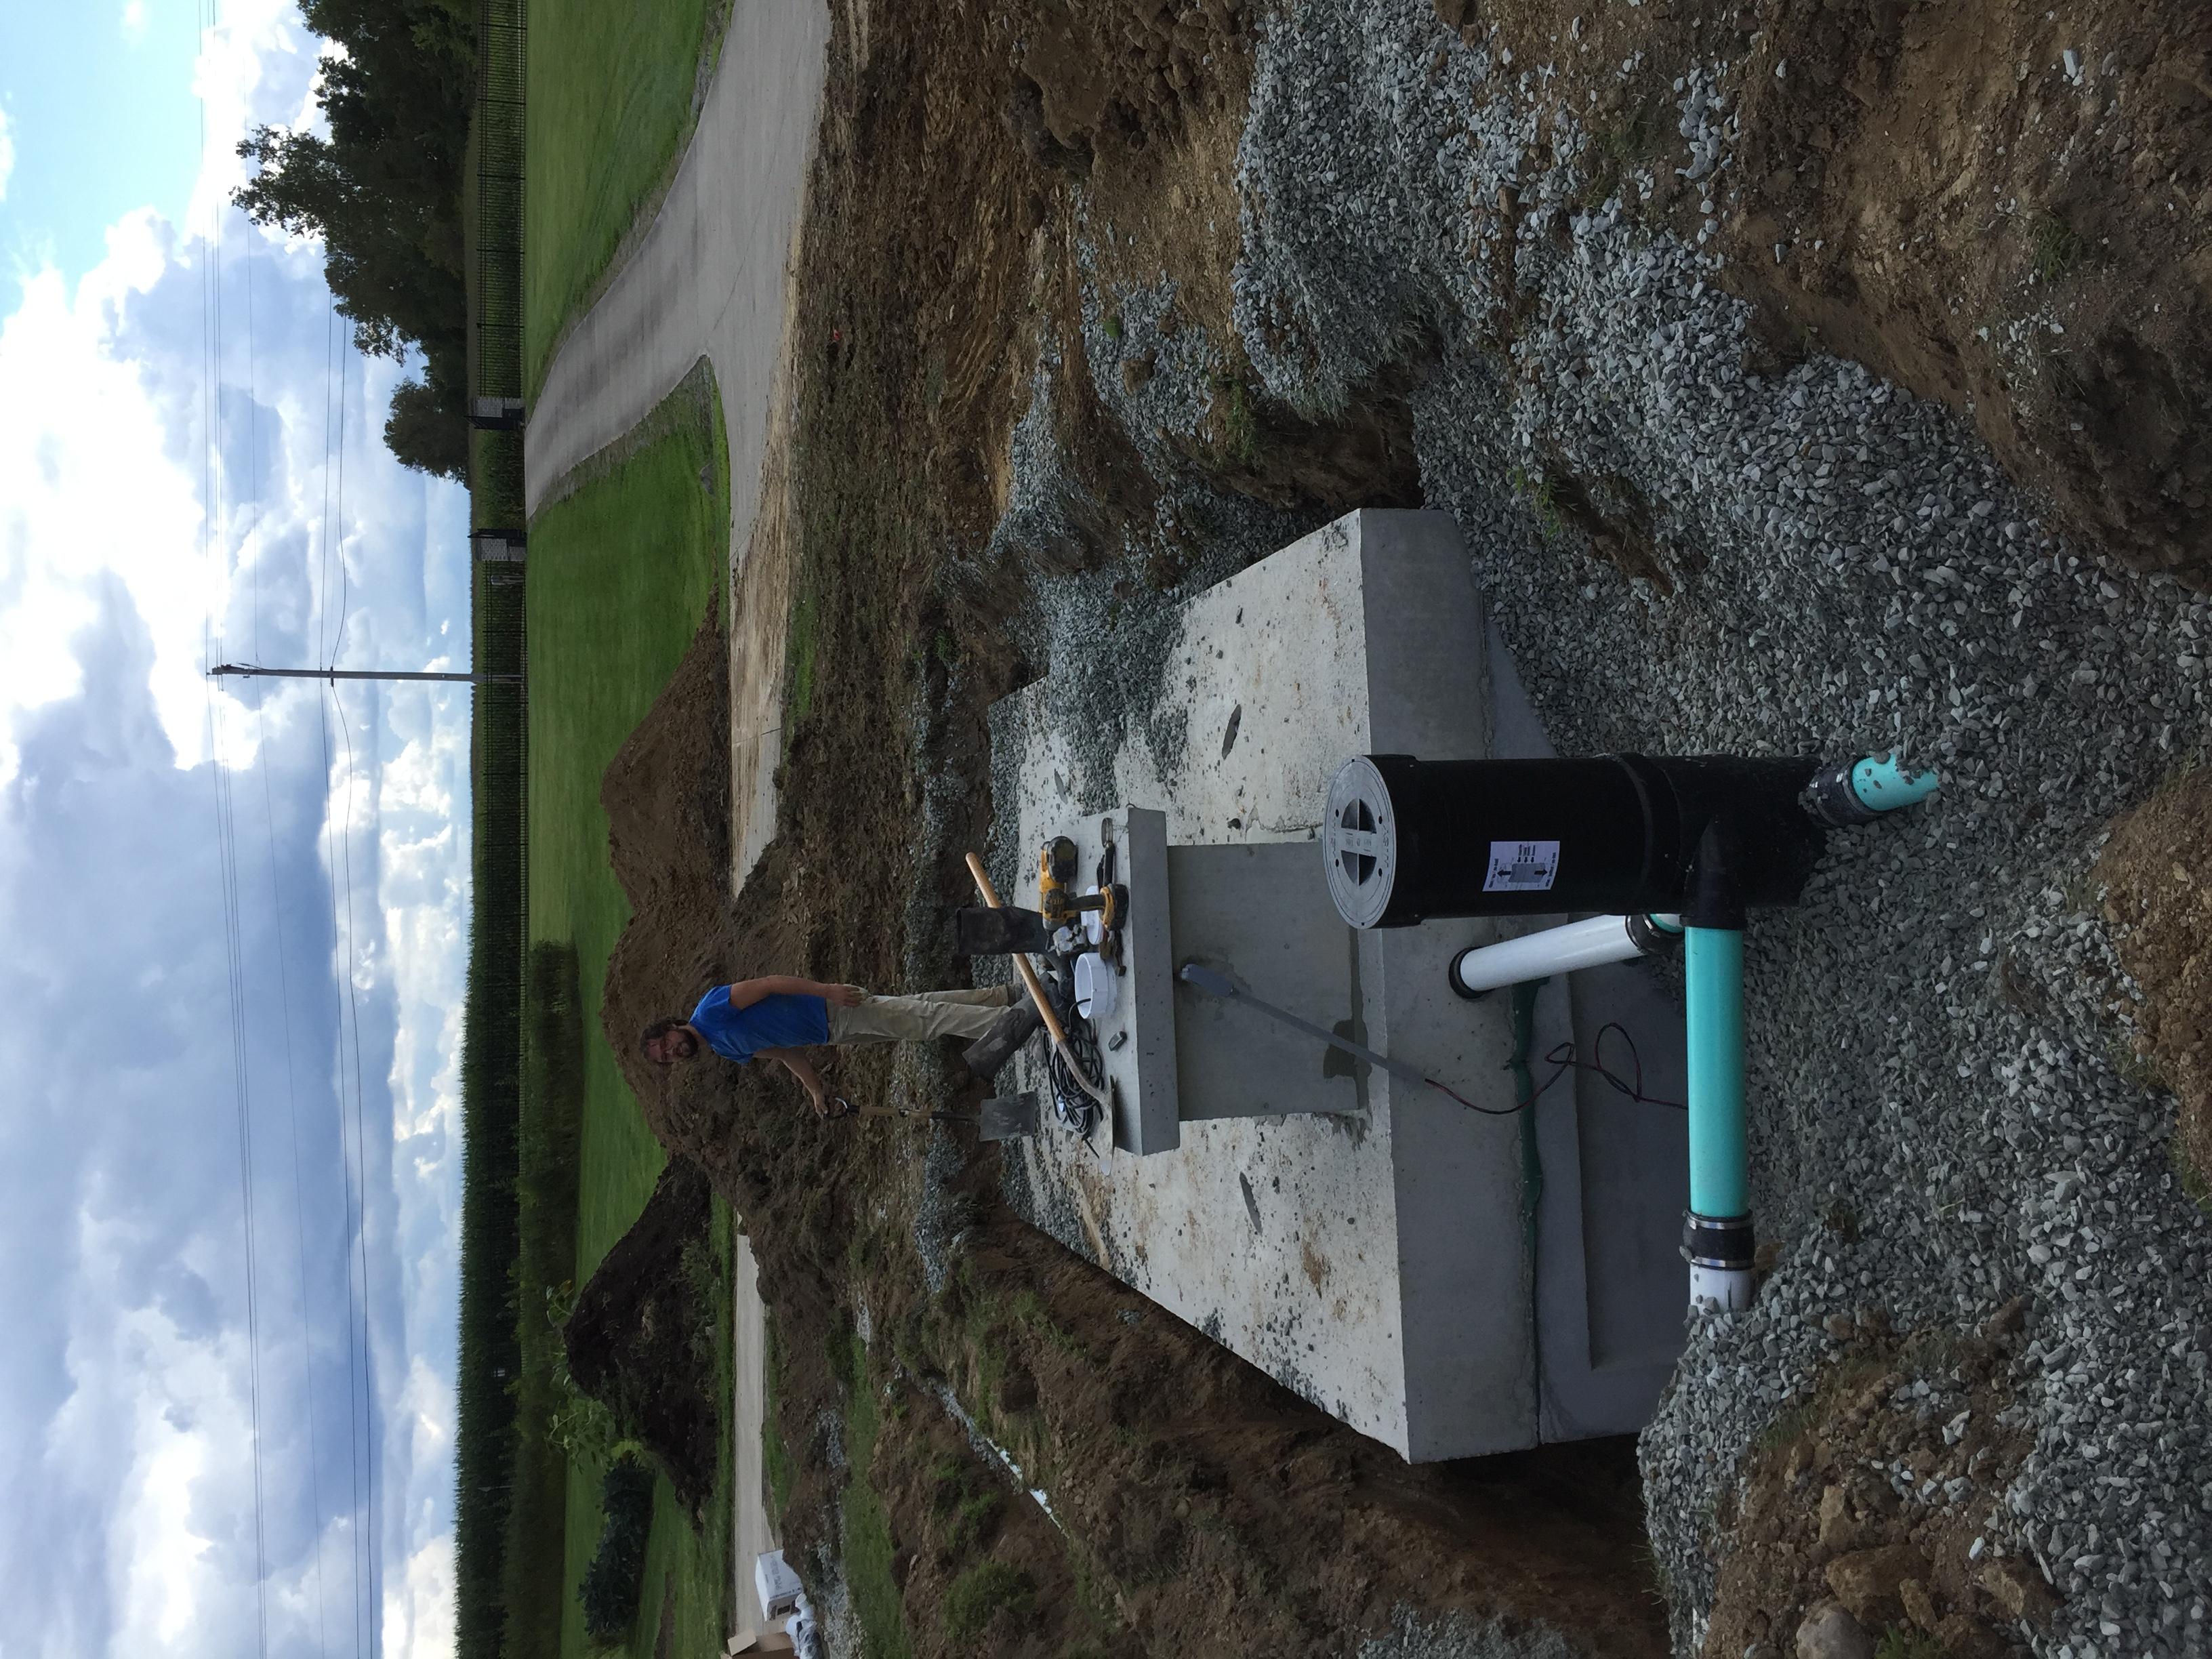 Concrete Cistern Wisy Vortex Filter